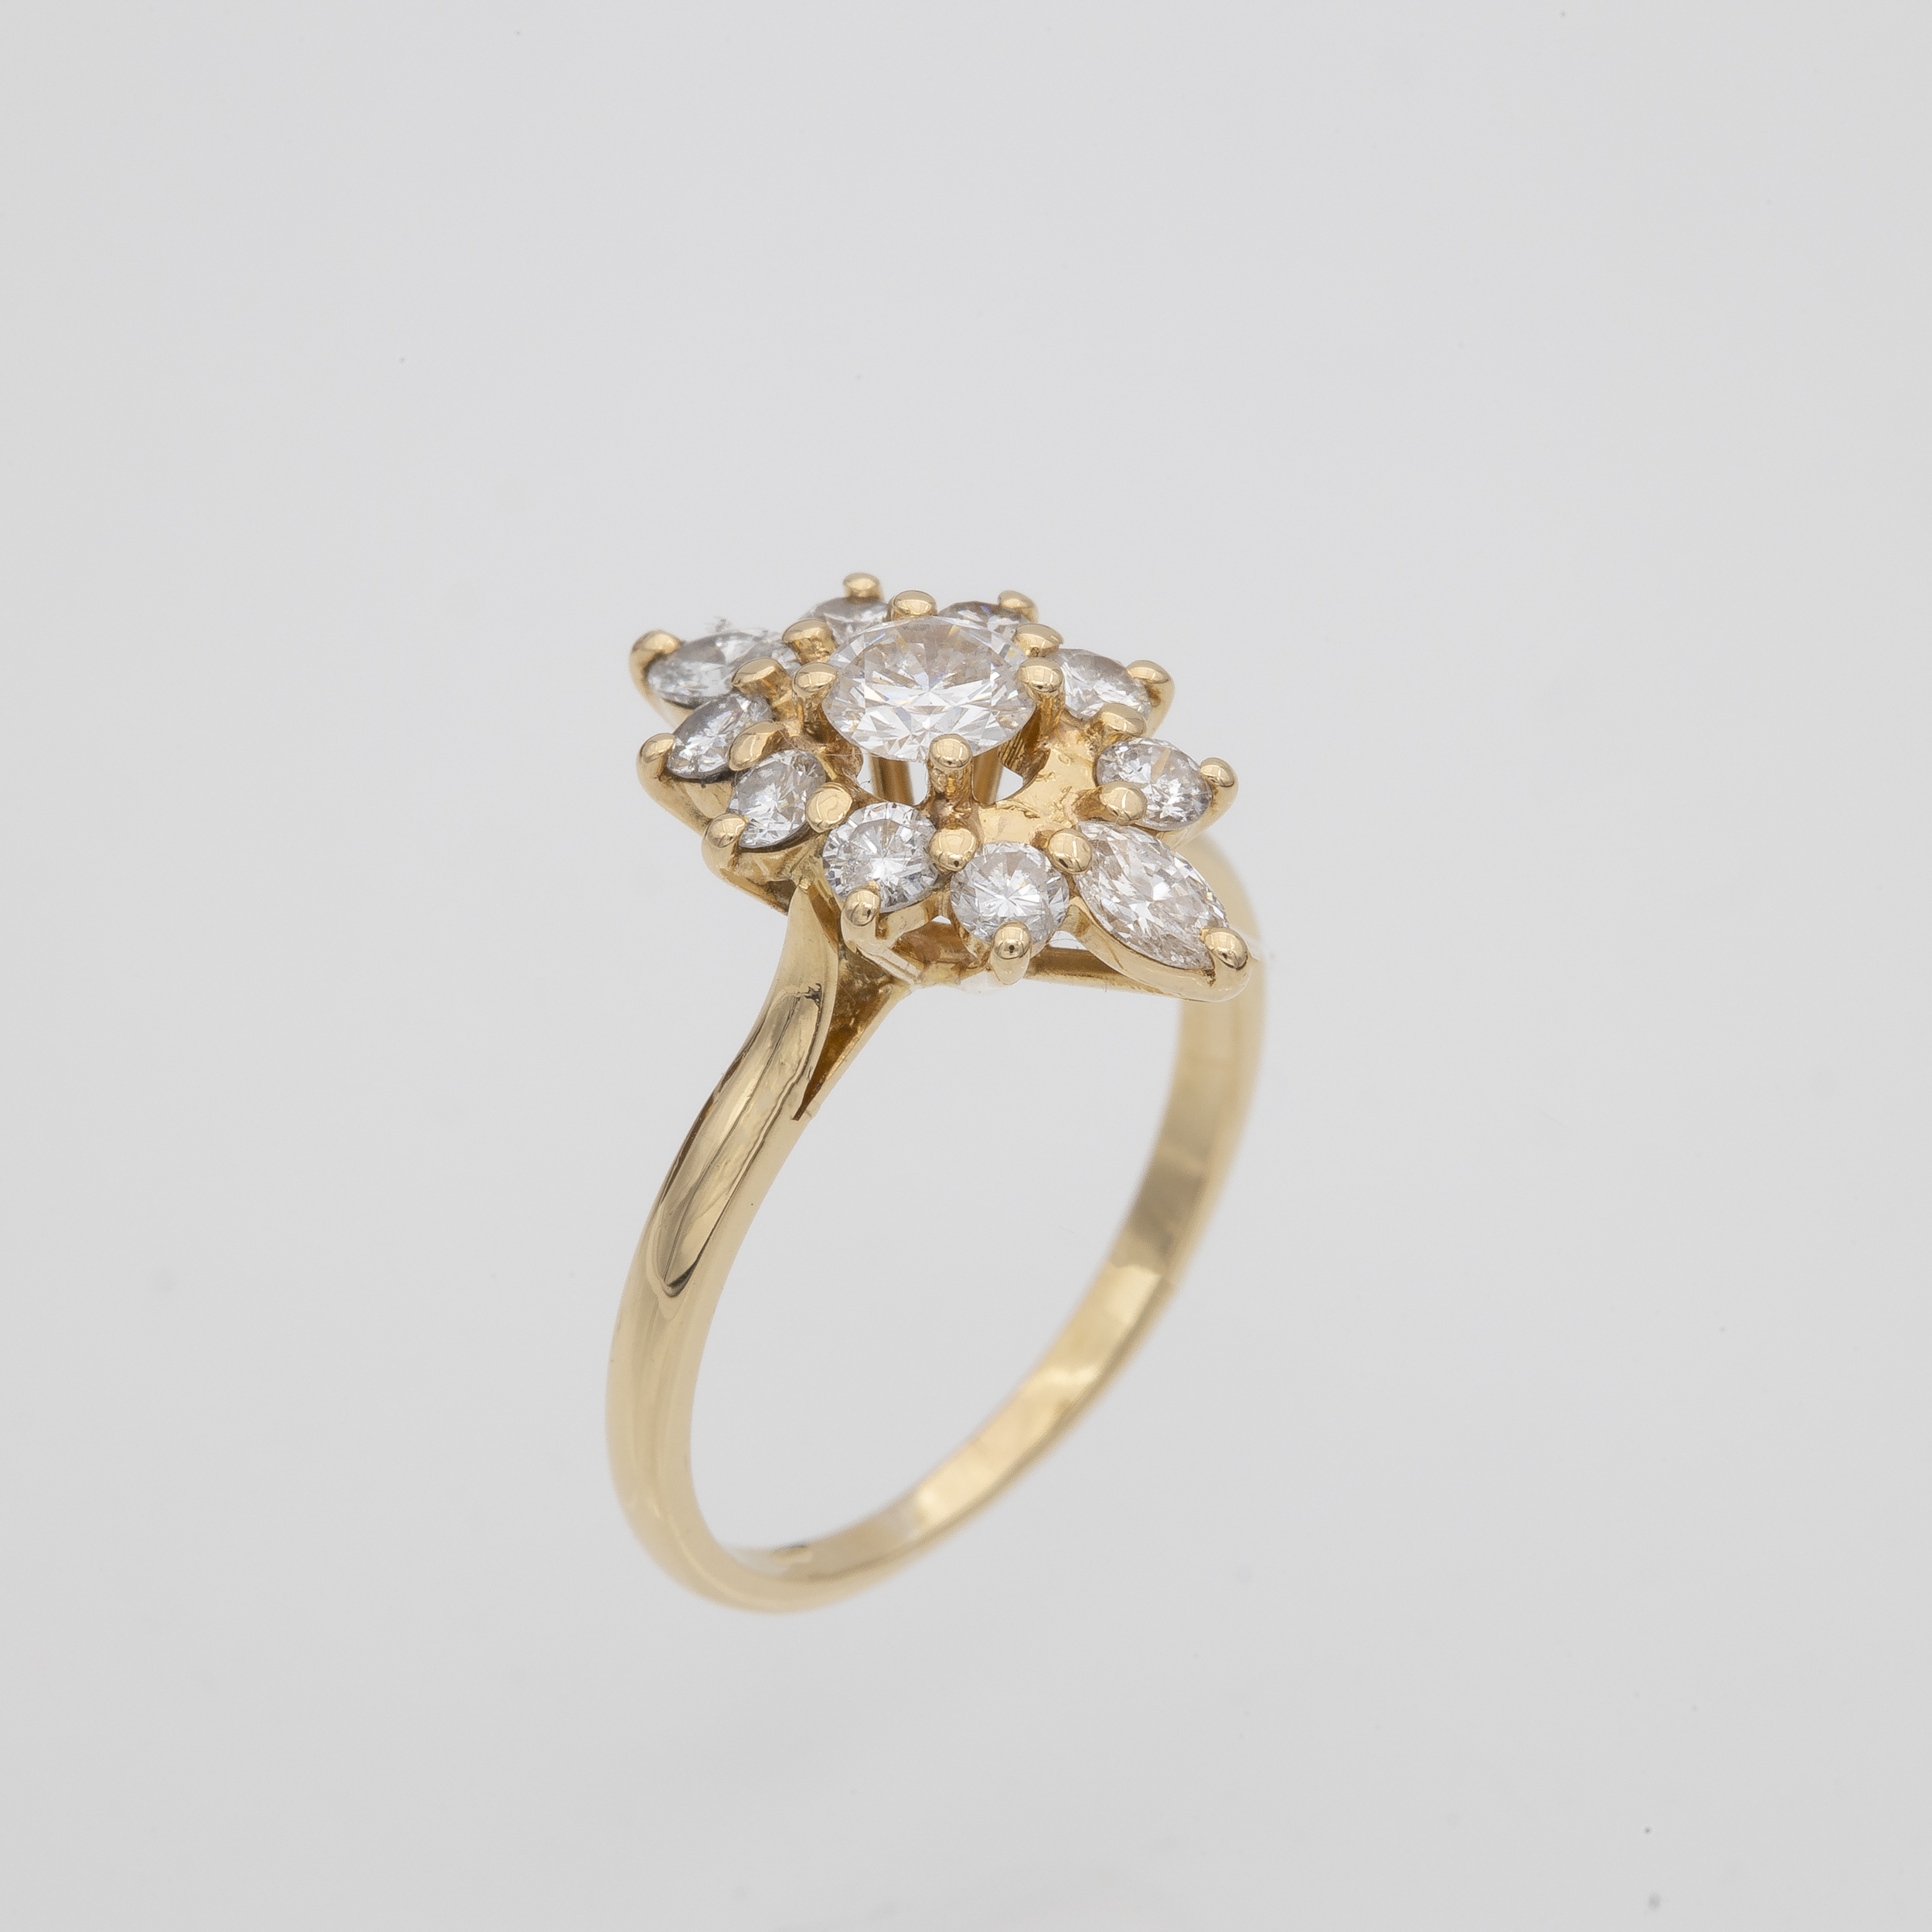 Bague or jaune marquise diamants